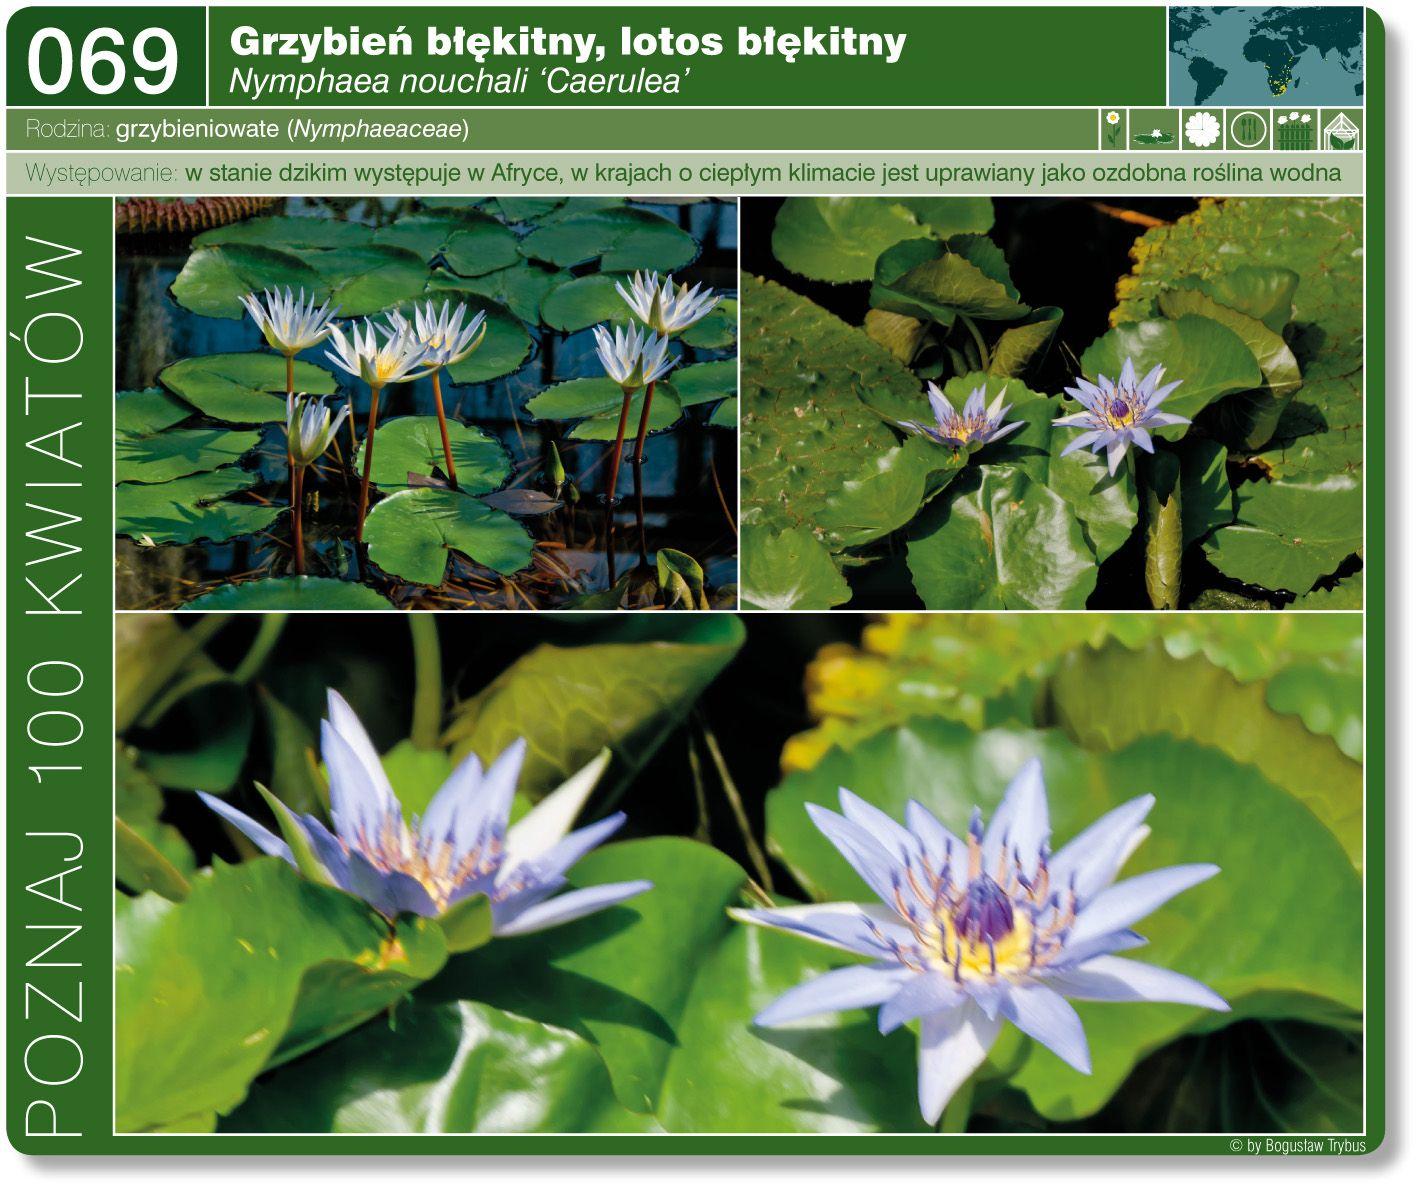 Grzybien Blekitny Plants